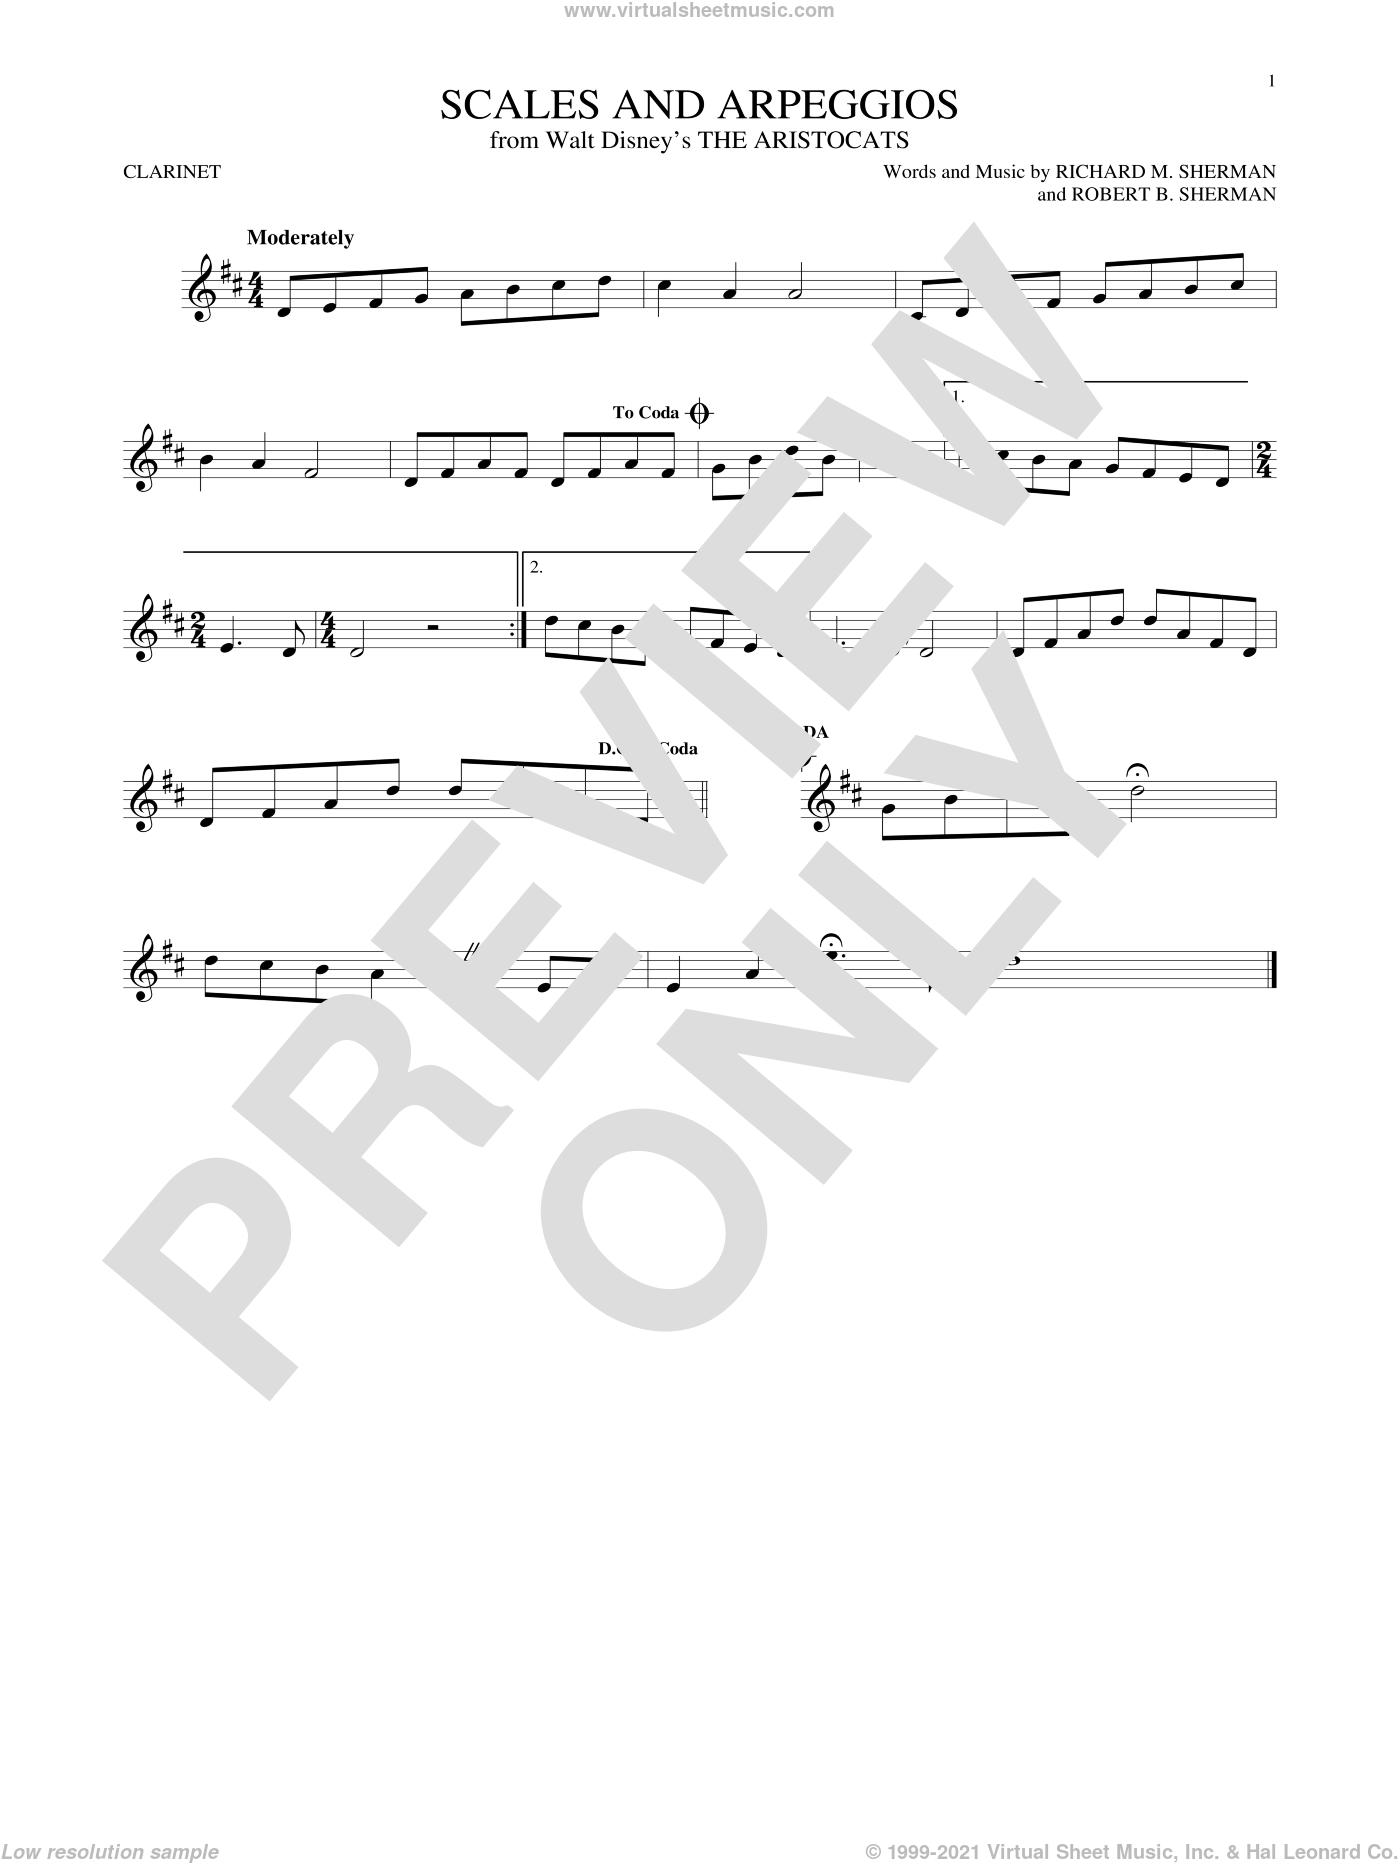 Scales And Arpeggios sheet music for clarinet solo by Richard M. Sherman, Richard & Robert Sherman and Robert B. Sherman, intermediate skill level